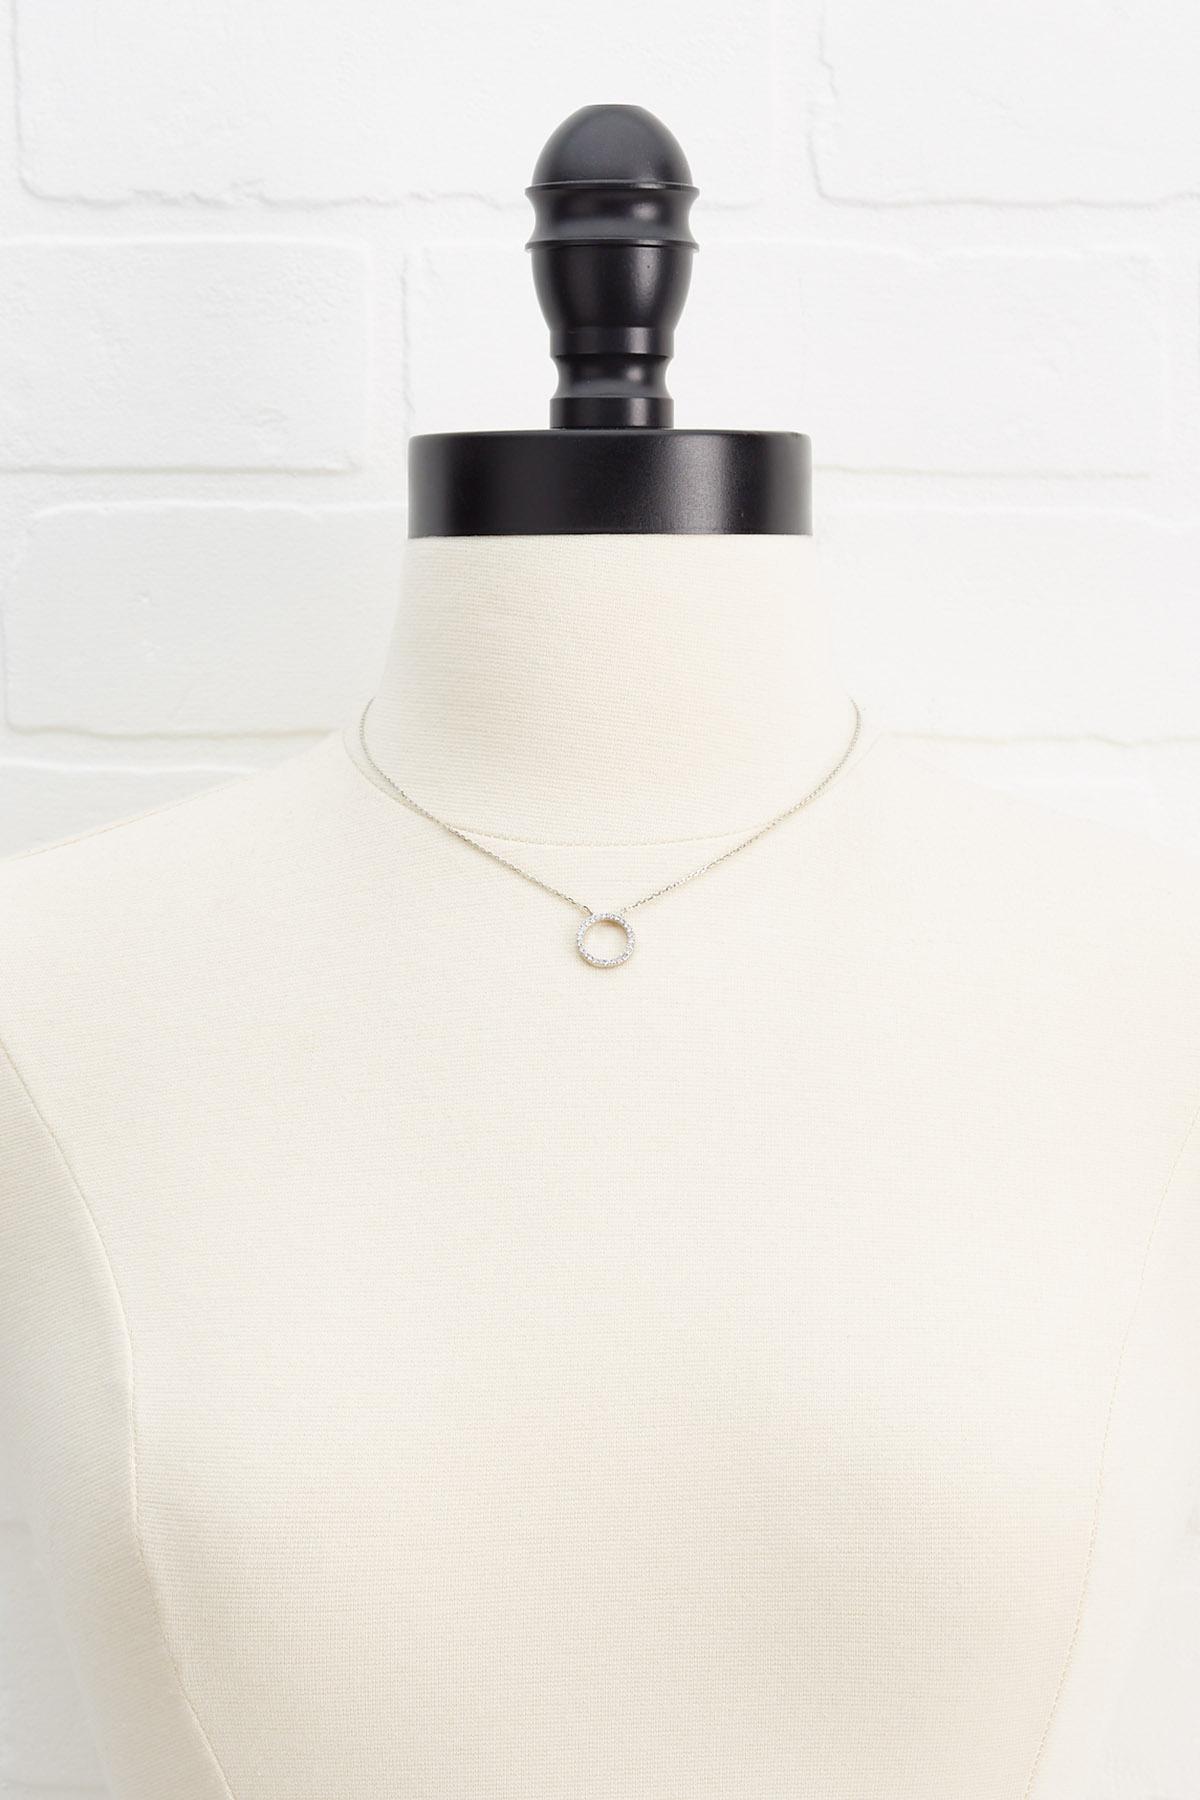 Bridesmaid Gift Necklace